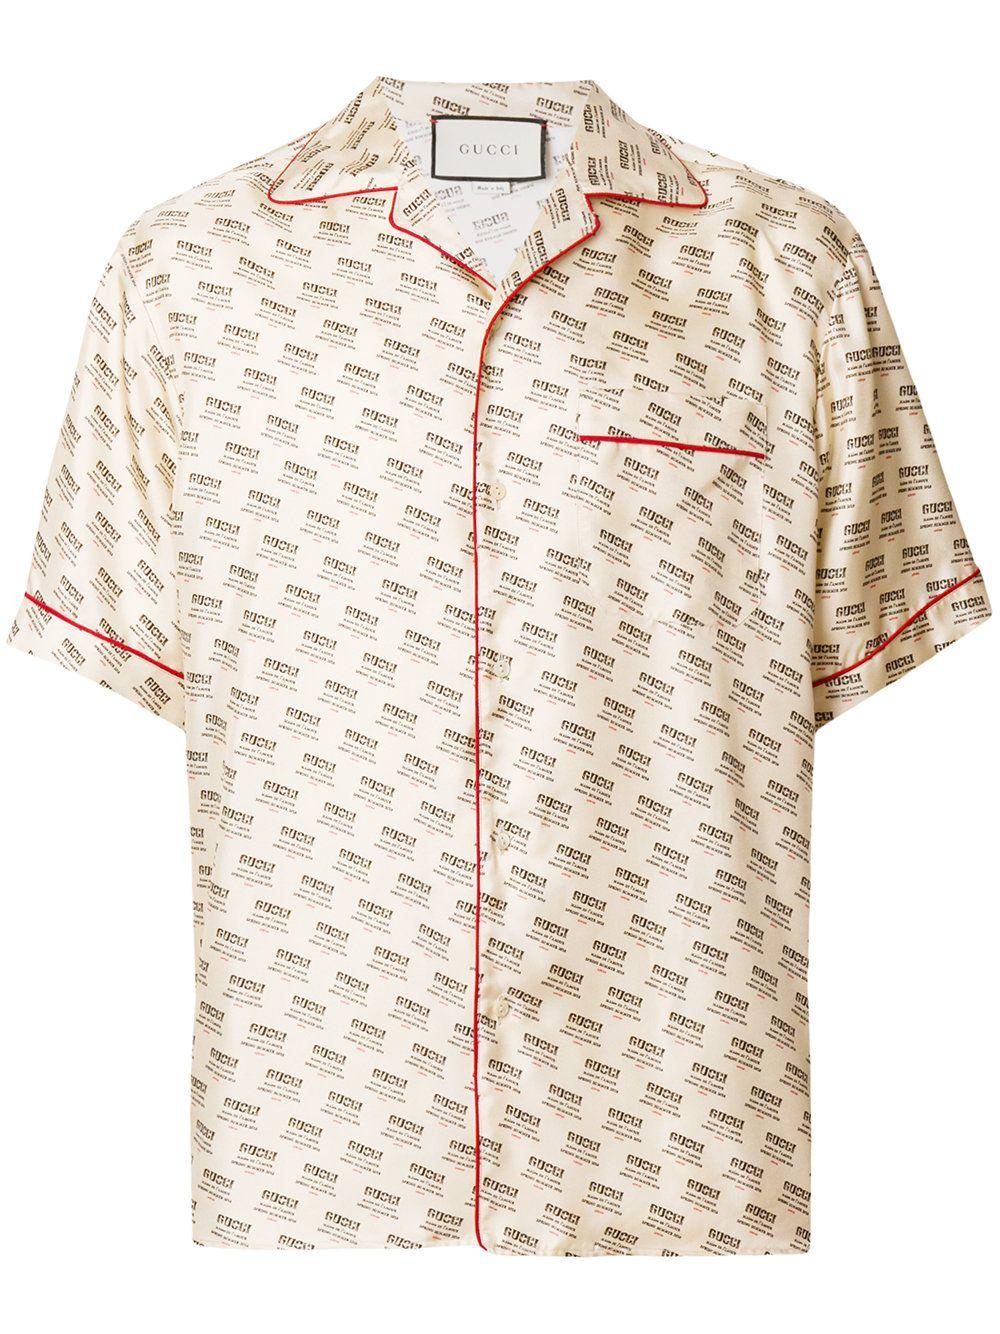 108e0cb89a6 Gucci invite stamp bowling shirt